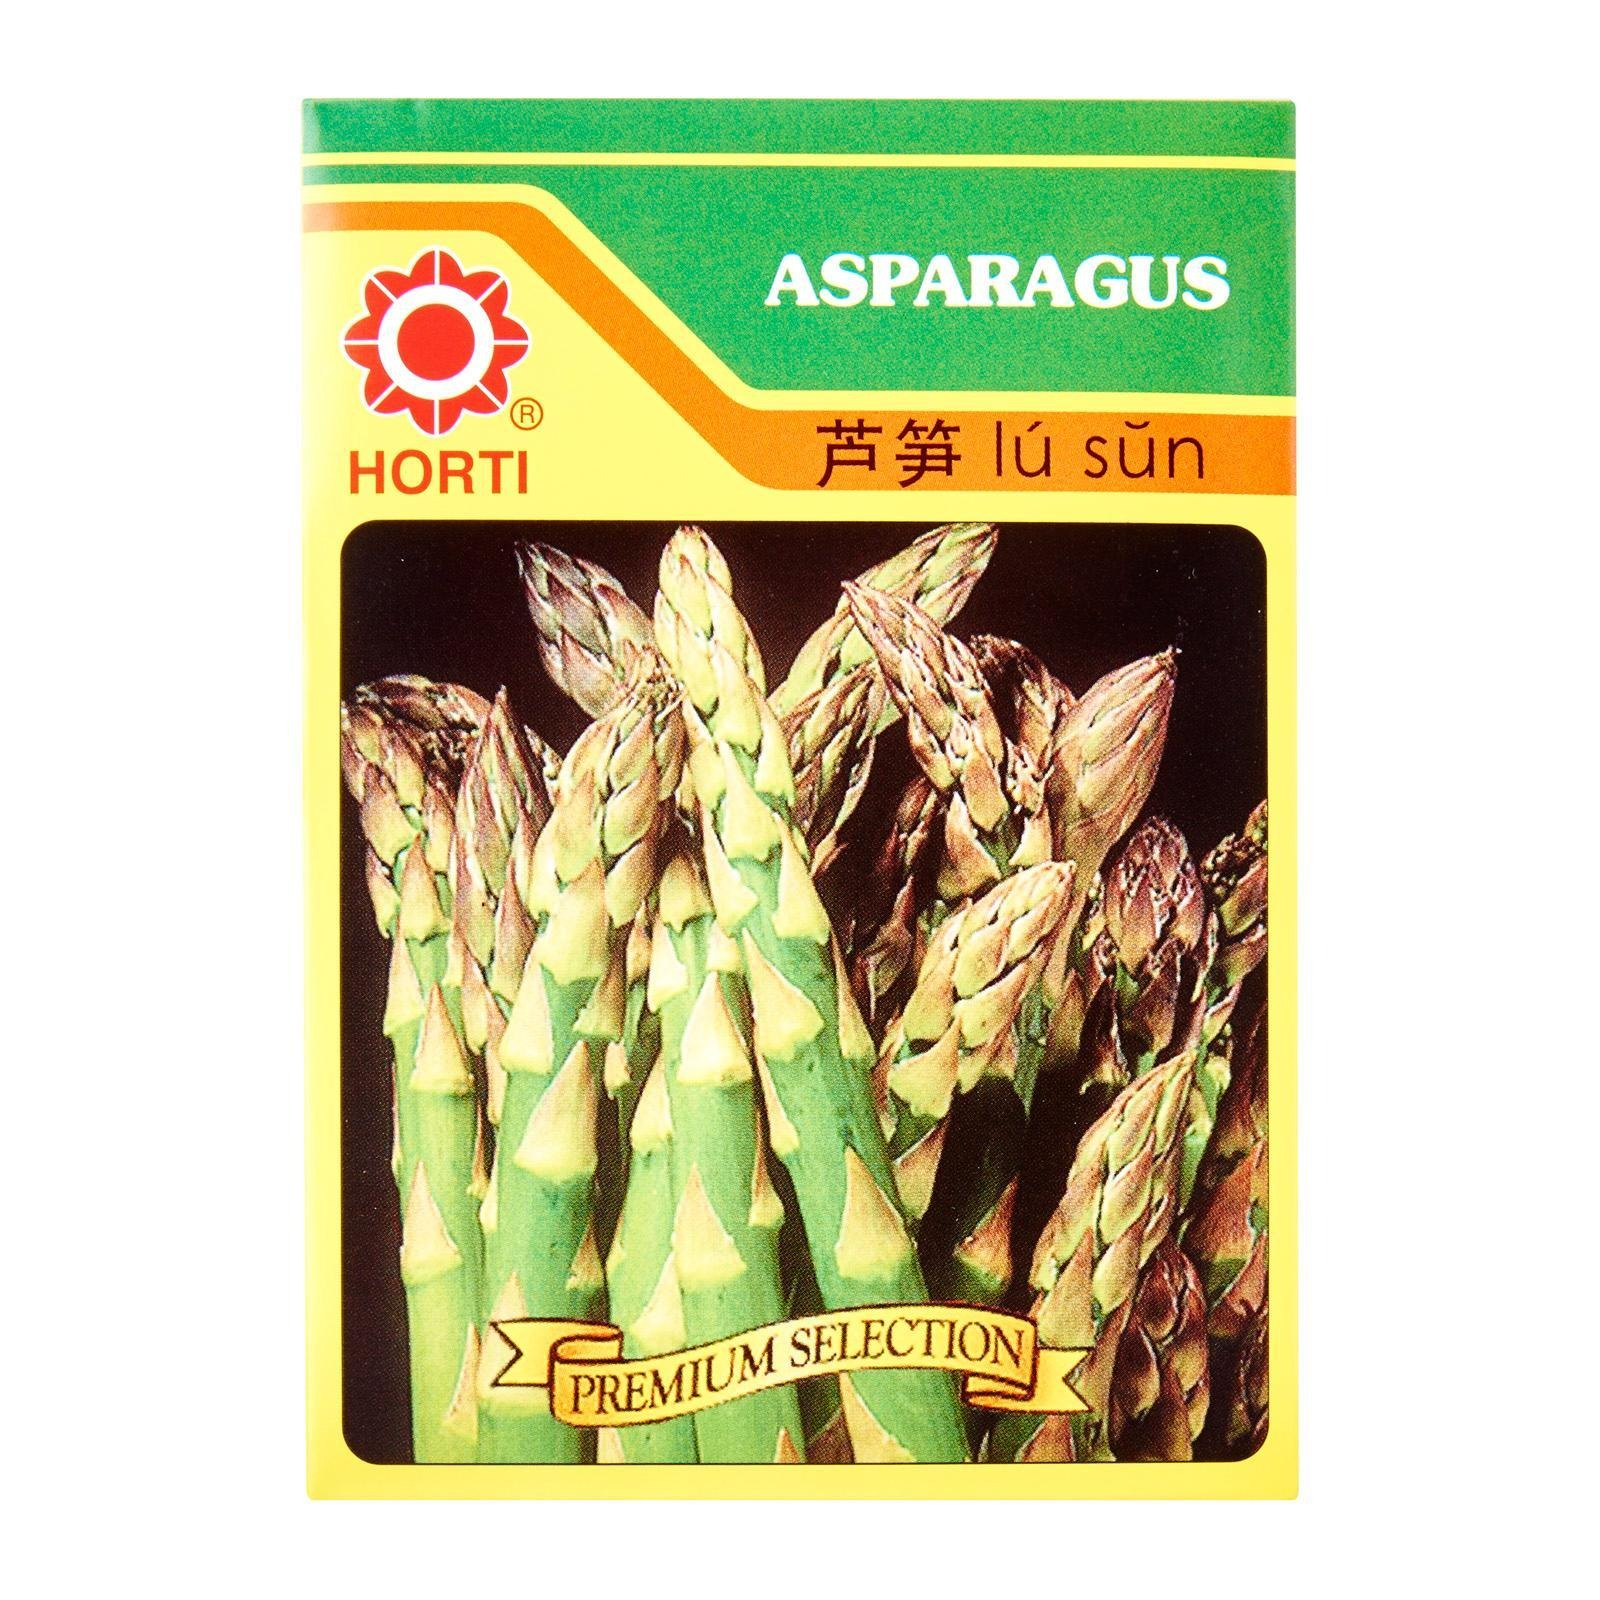 HORTI Asparagus Seeds